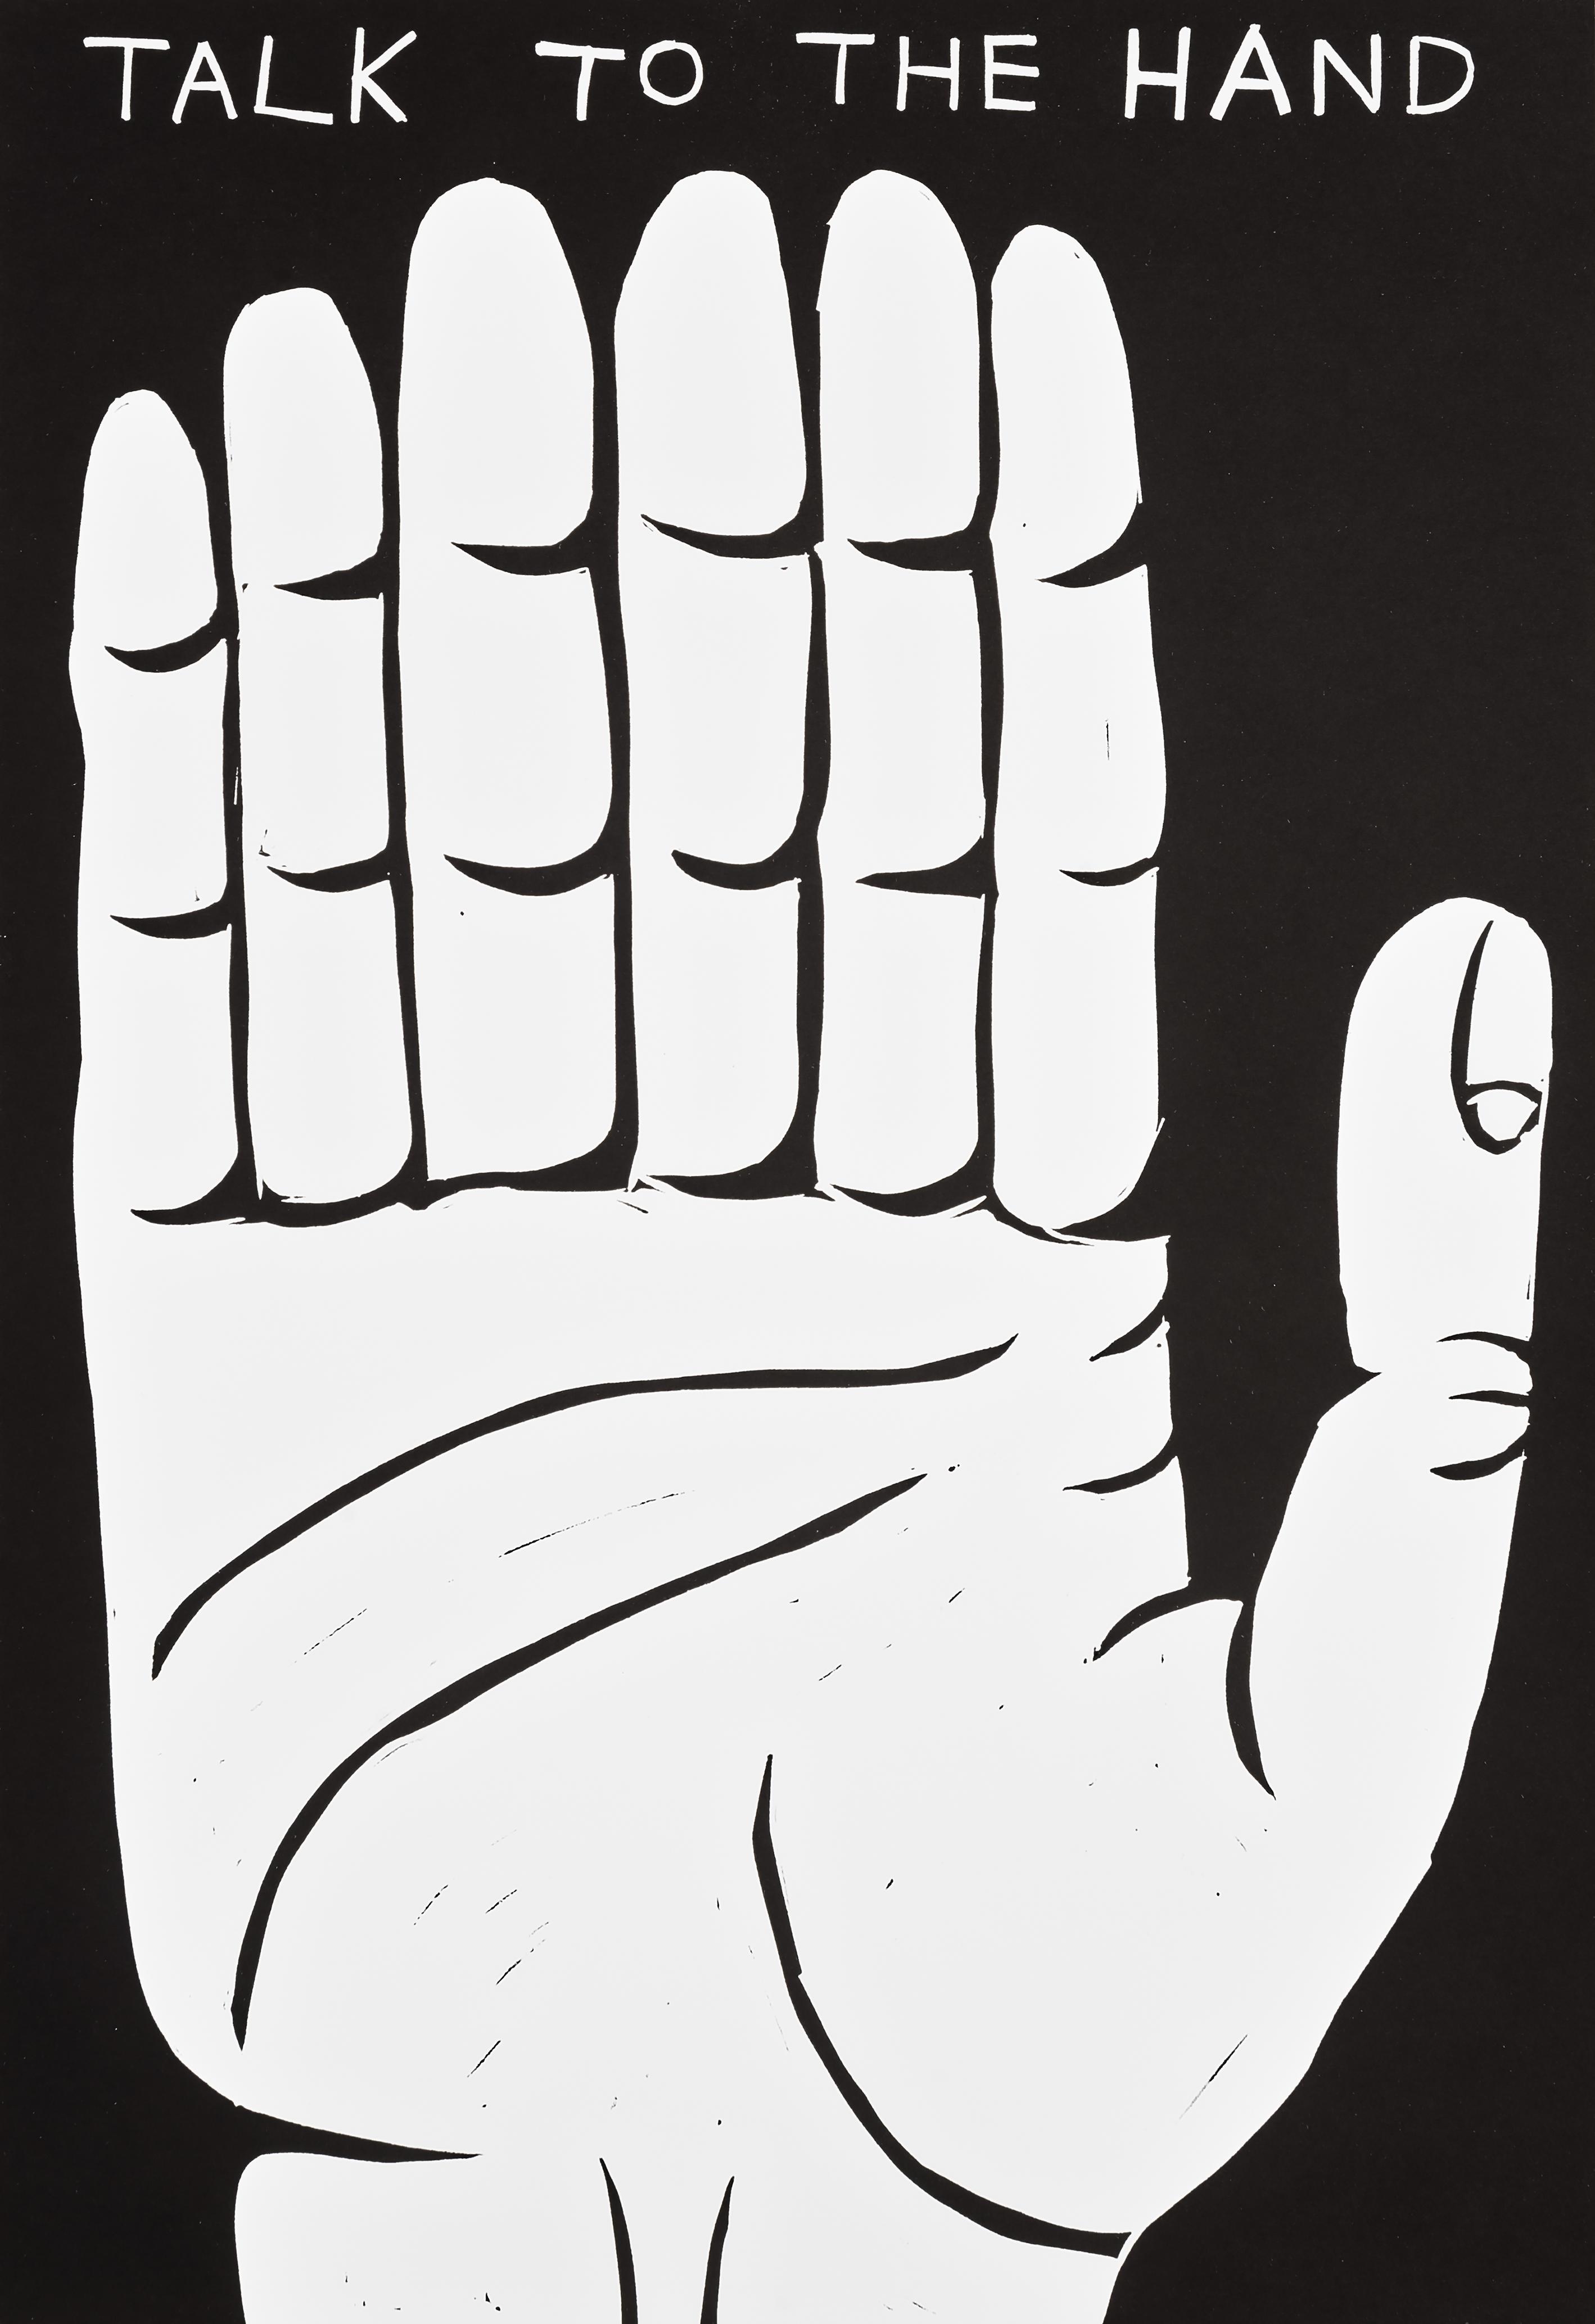 David Shrigley (British 1968-), 'Talk To The Hand', 2021